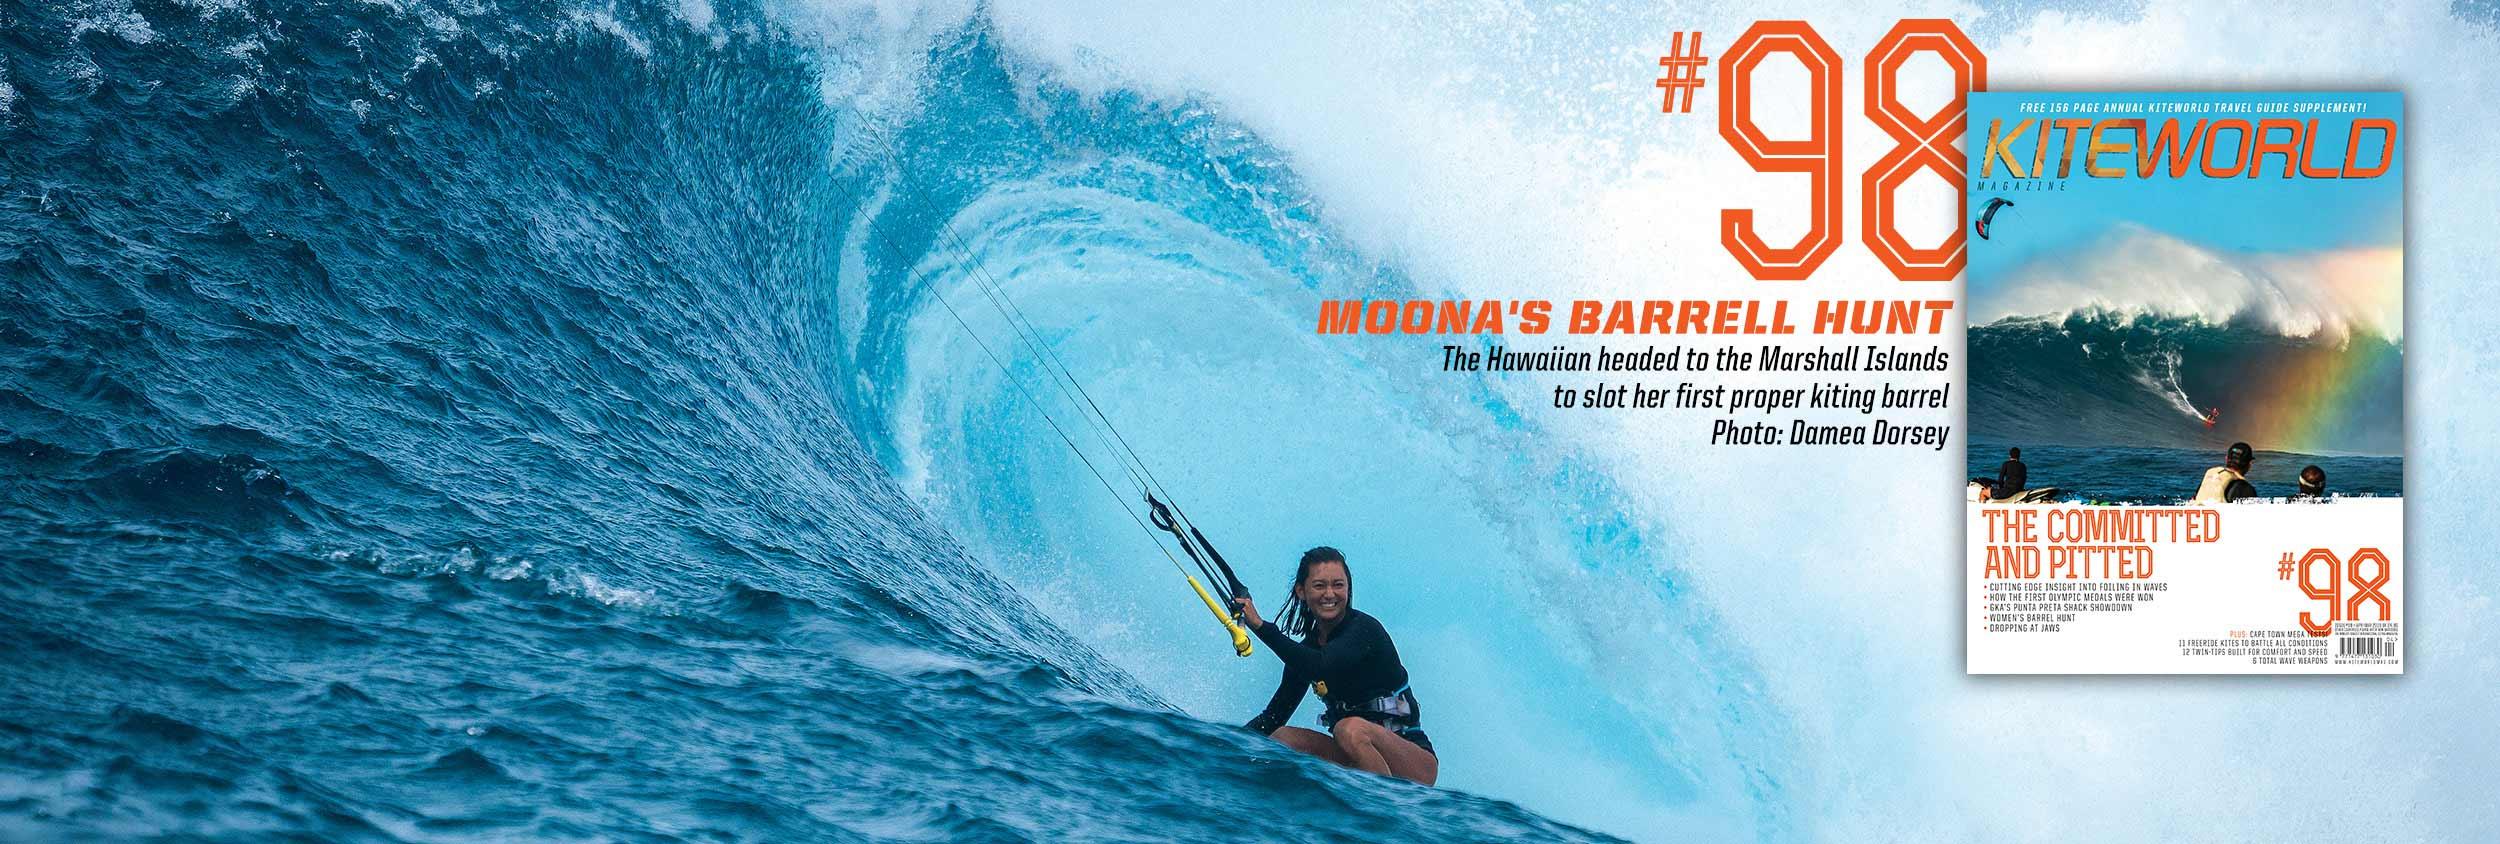 KW#98 Moona Whyte kitesurfing barrels in the Marshall Islands